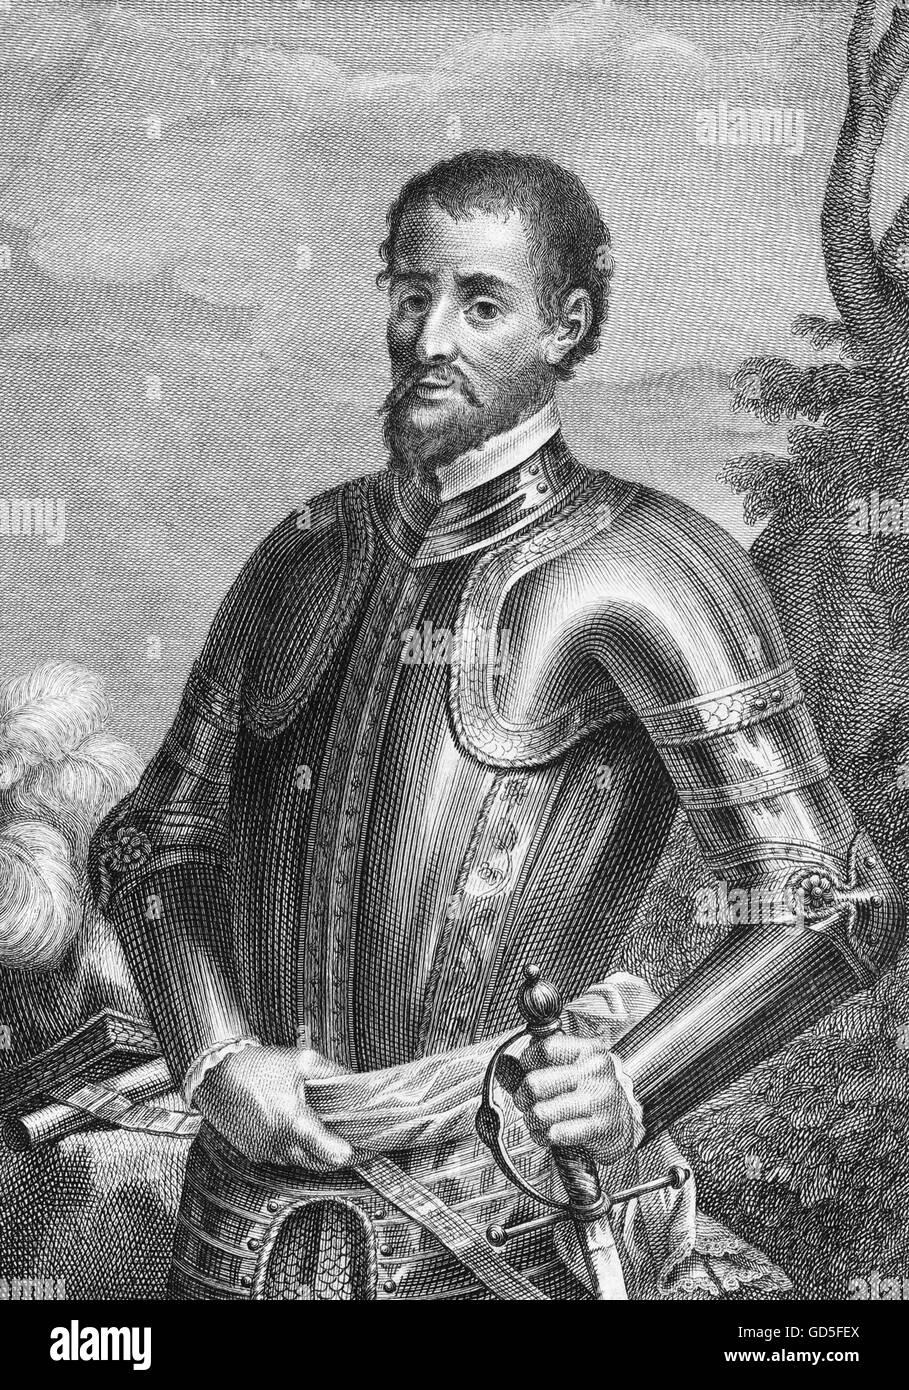 Hernando de Soto (c. 1500-1542), the Spanish explorer and conquistador who led the first European expedition into - Stock Image